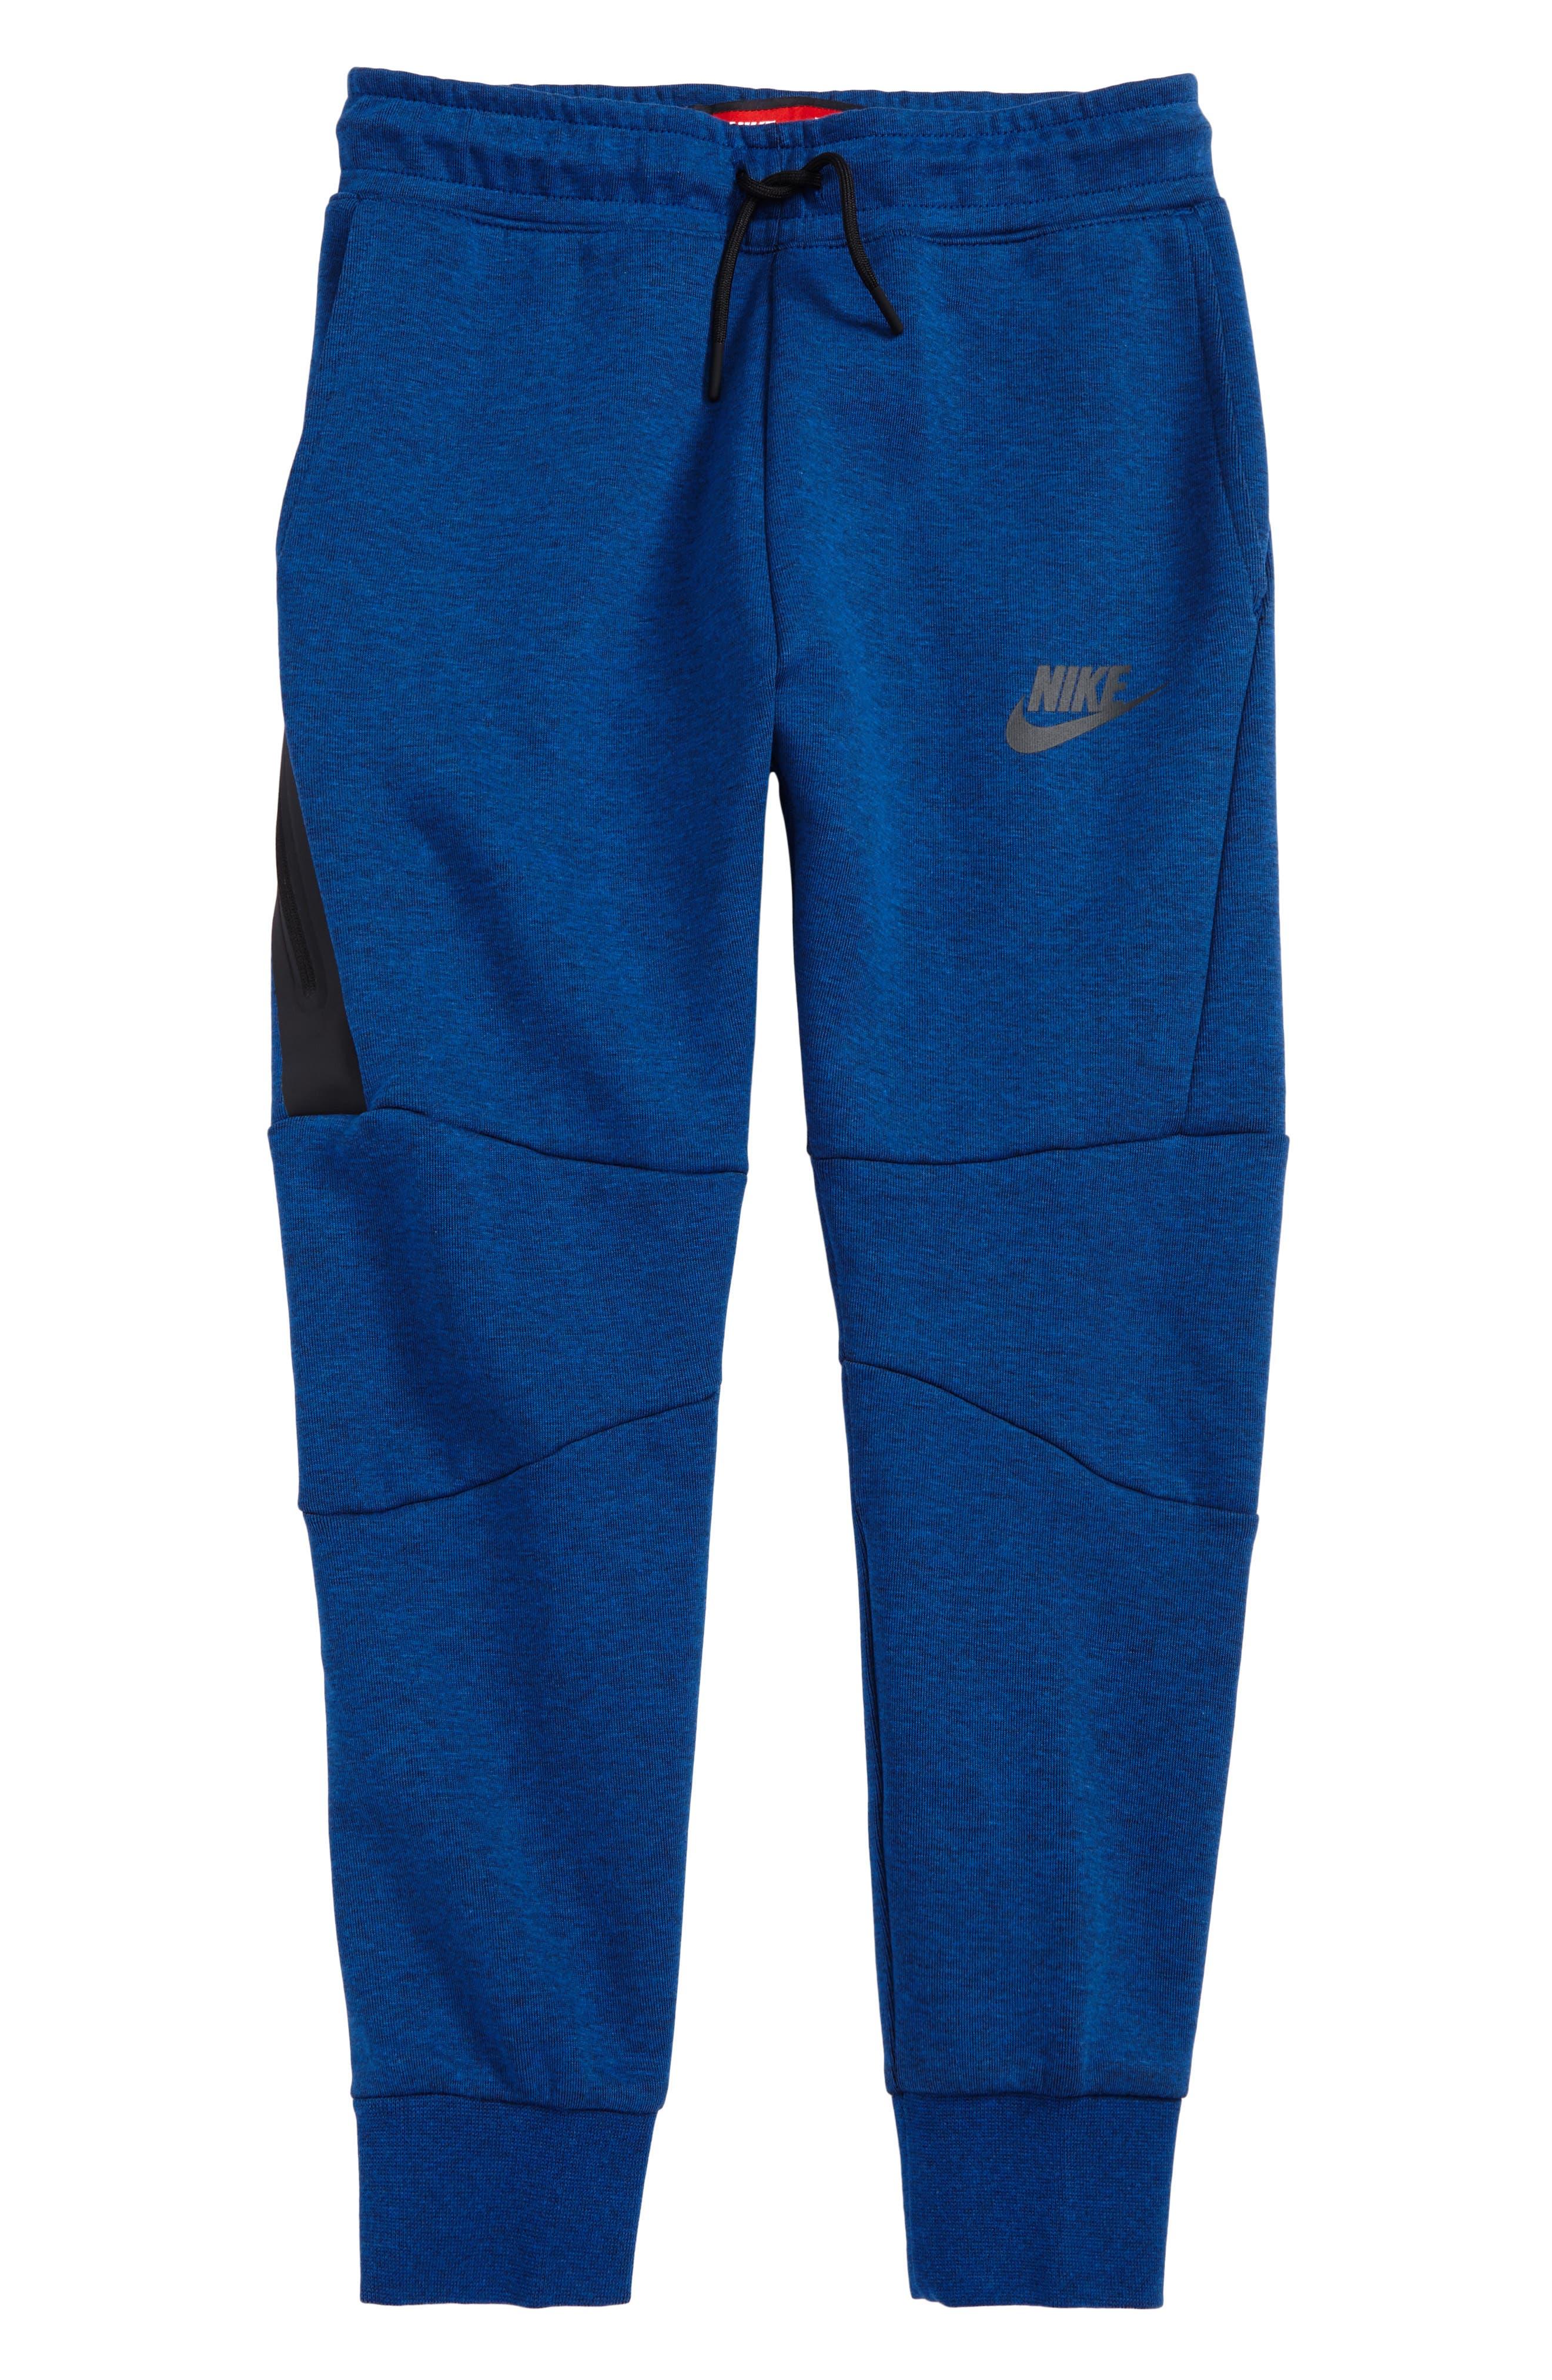 Alternate Image 1 Selected - Nike Tech Fleece Pants (Little Boys & Big Boys)